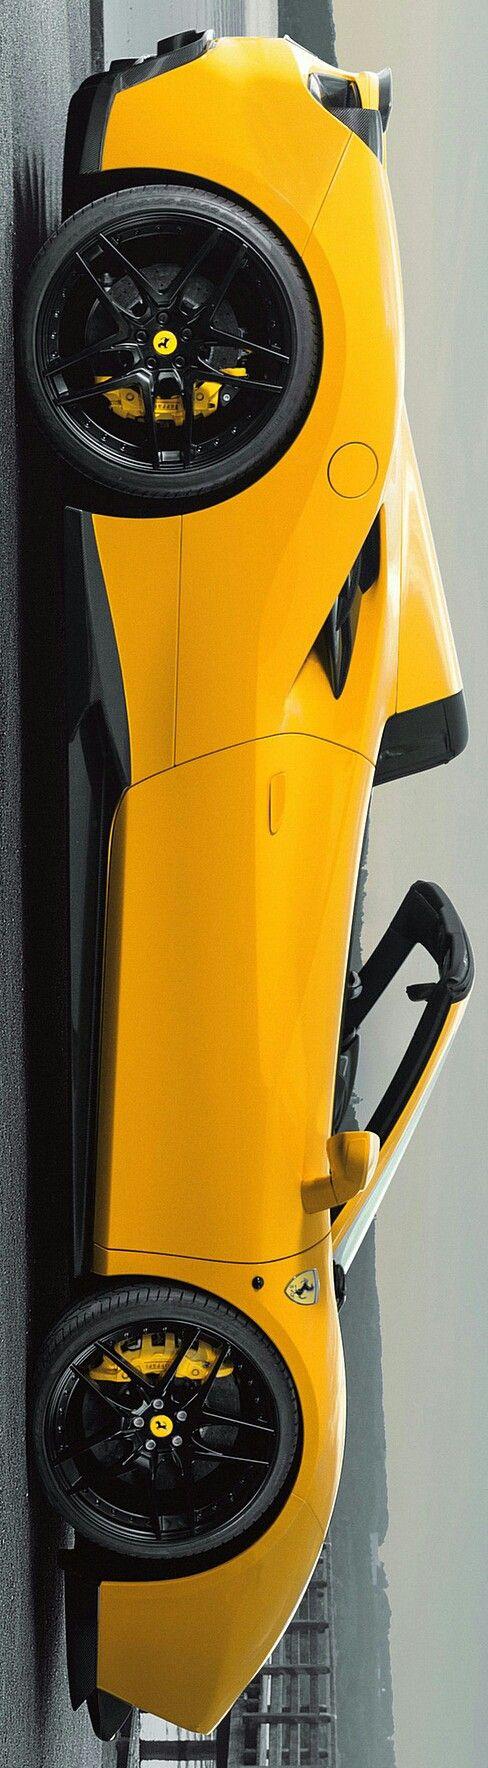 2017 NOVITEC ROSSO Ferrari 488 Spider by Levon